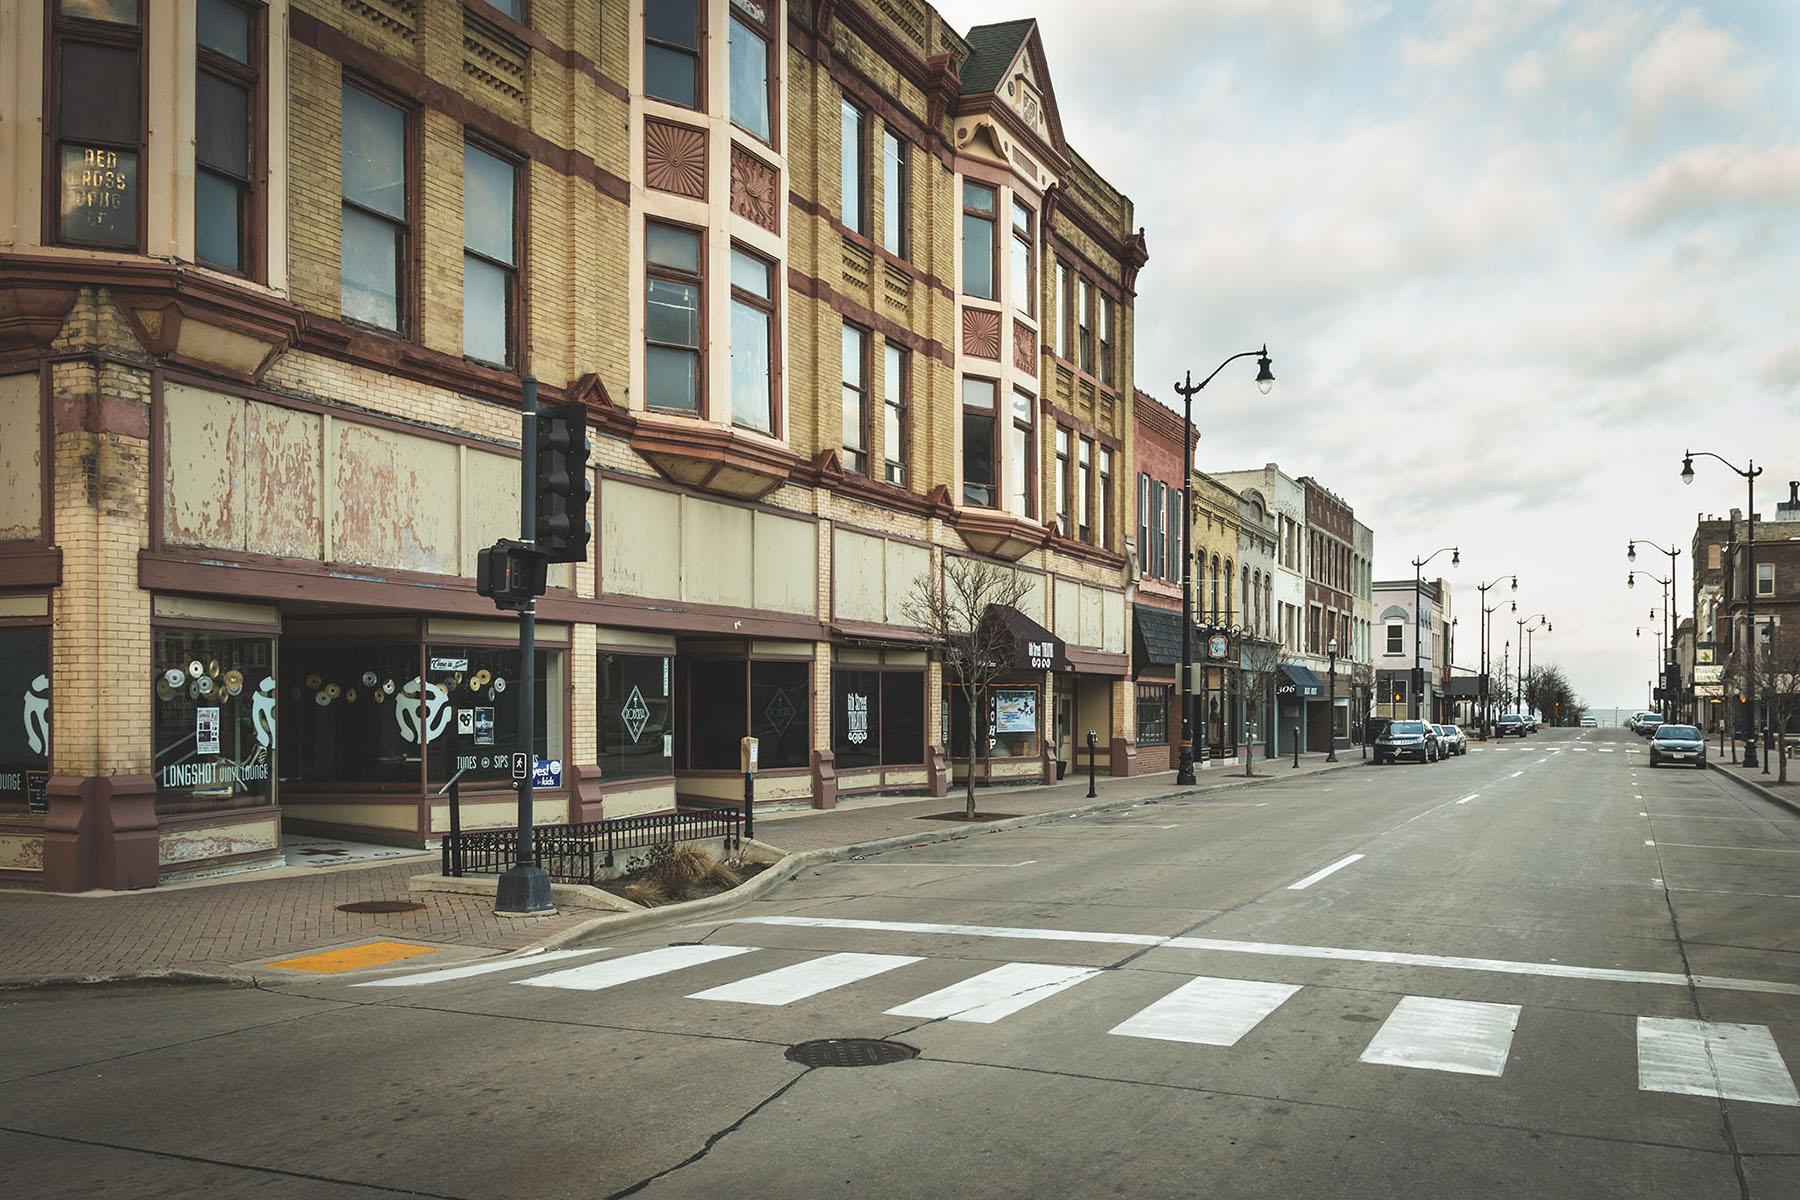 6th Street, Racine, Wisconsin